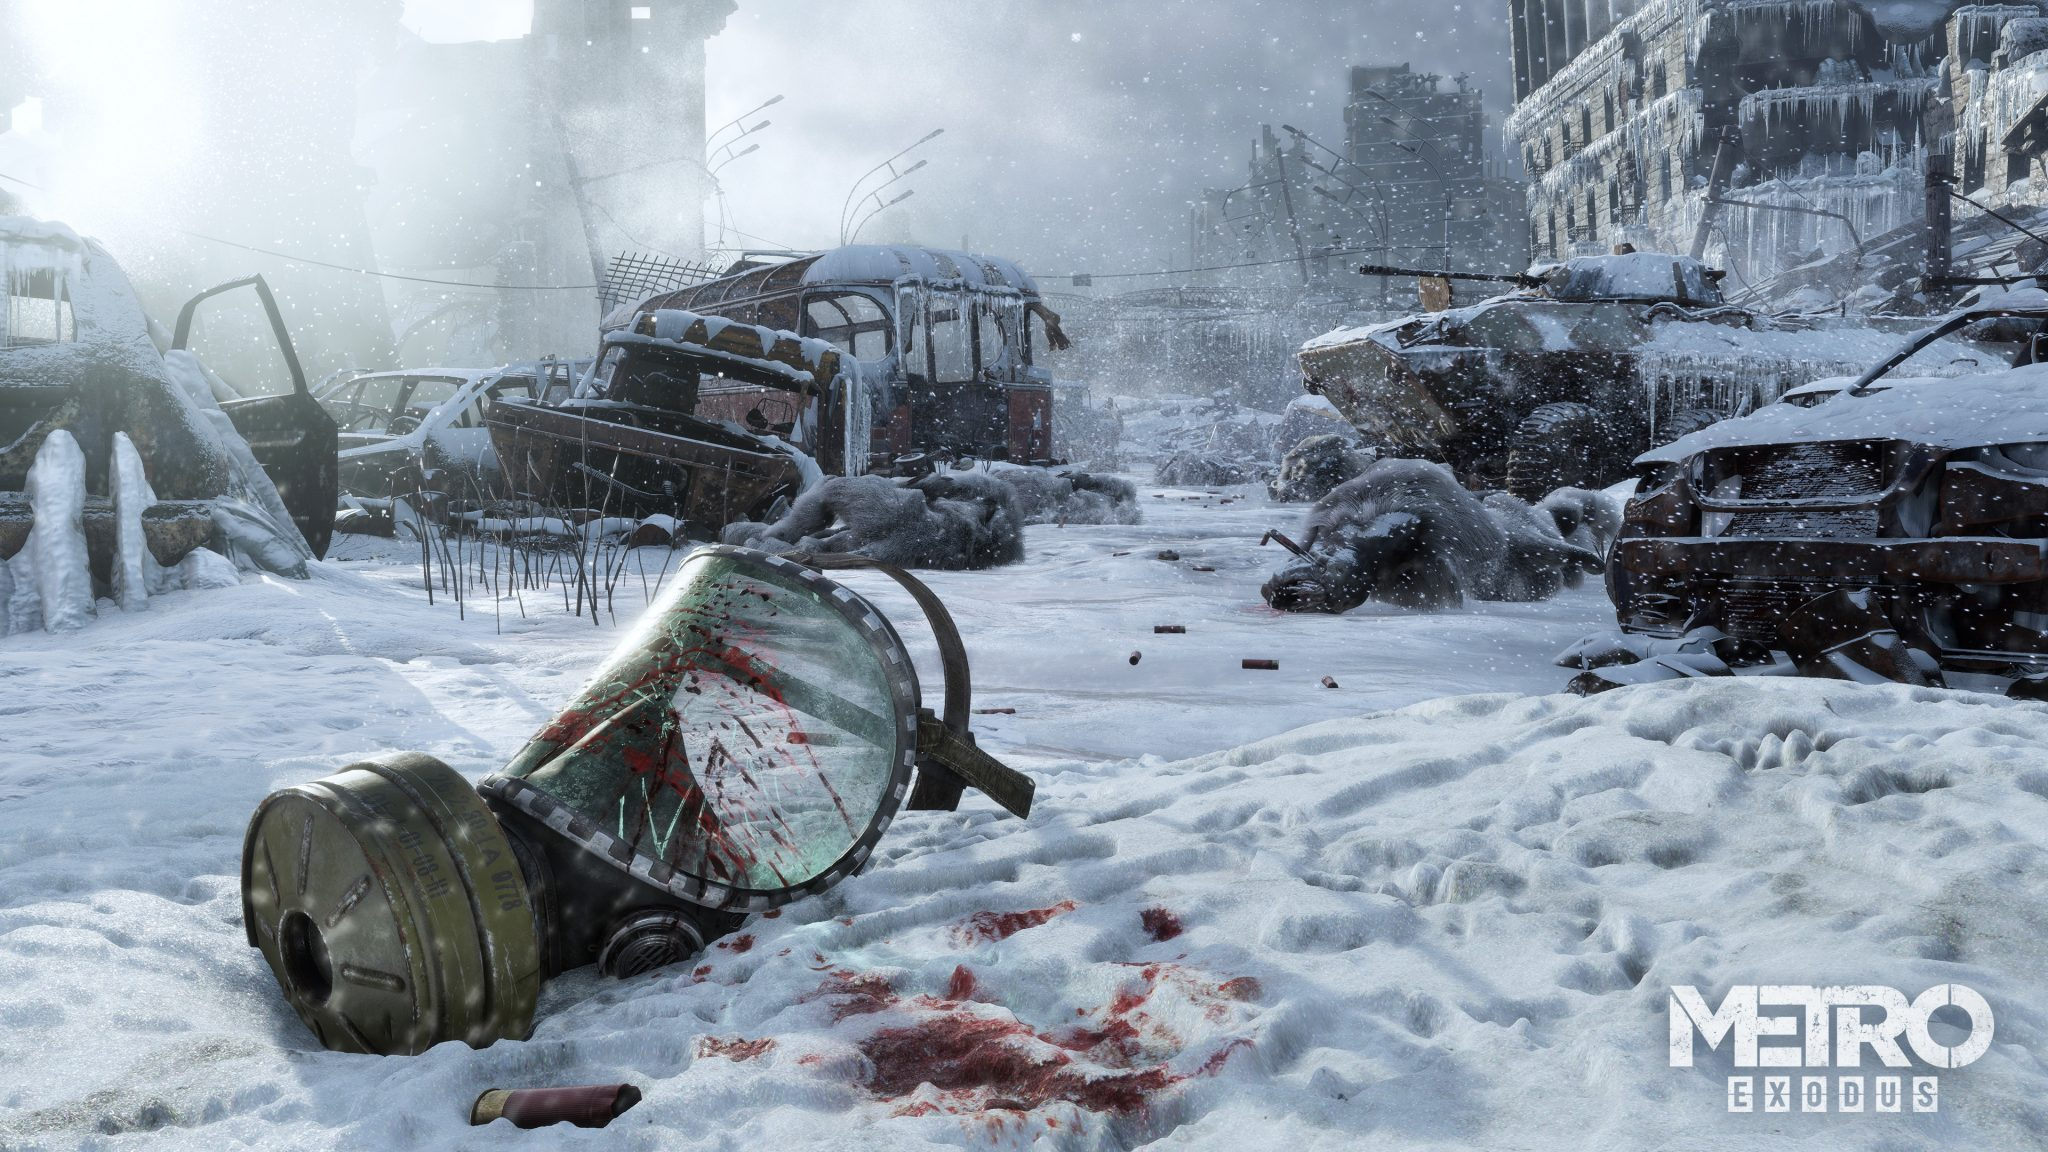 Metro Exodus Screenshot Preview Gamescom 2018 Deep Silver Ego-Shooter Fazit